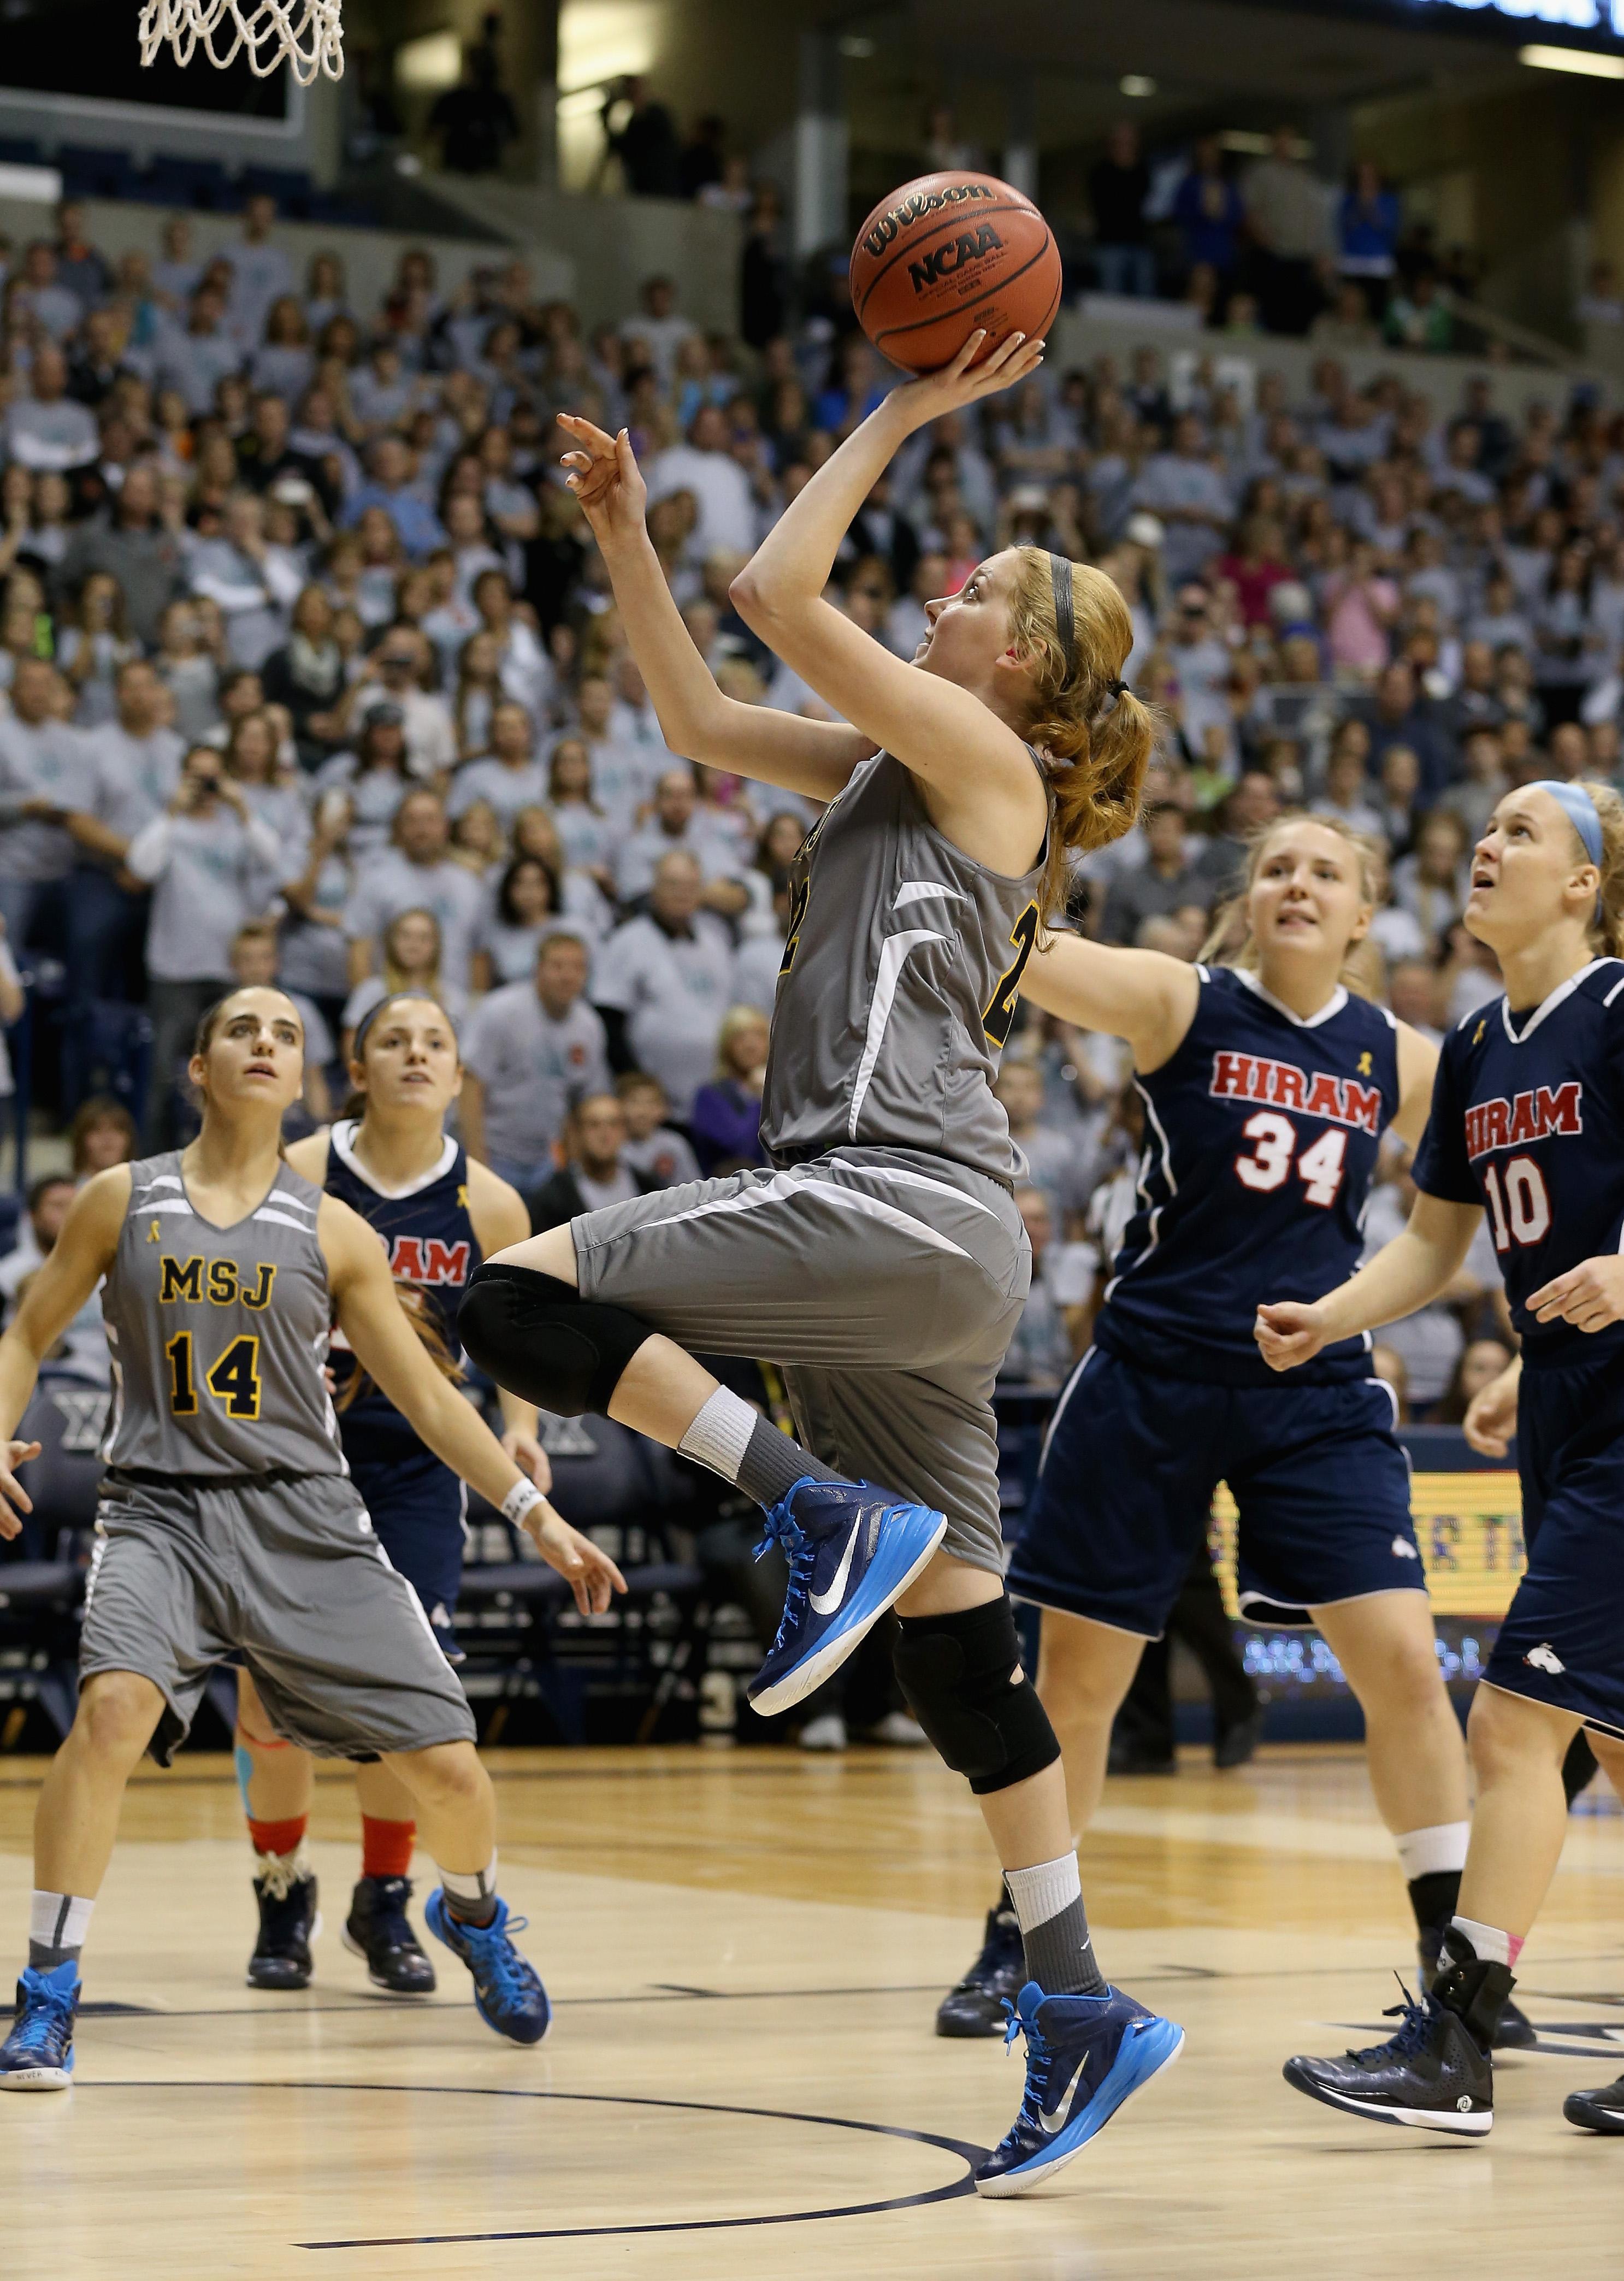 Terminally Ill Player Scores First Basket Of NCAA Season